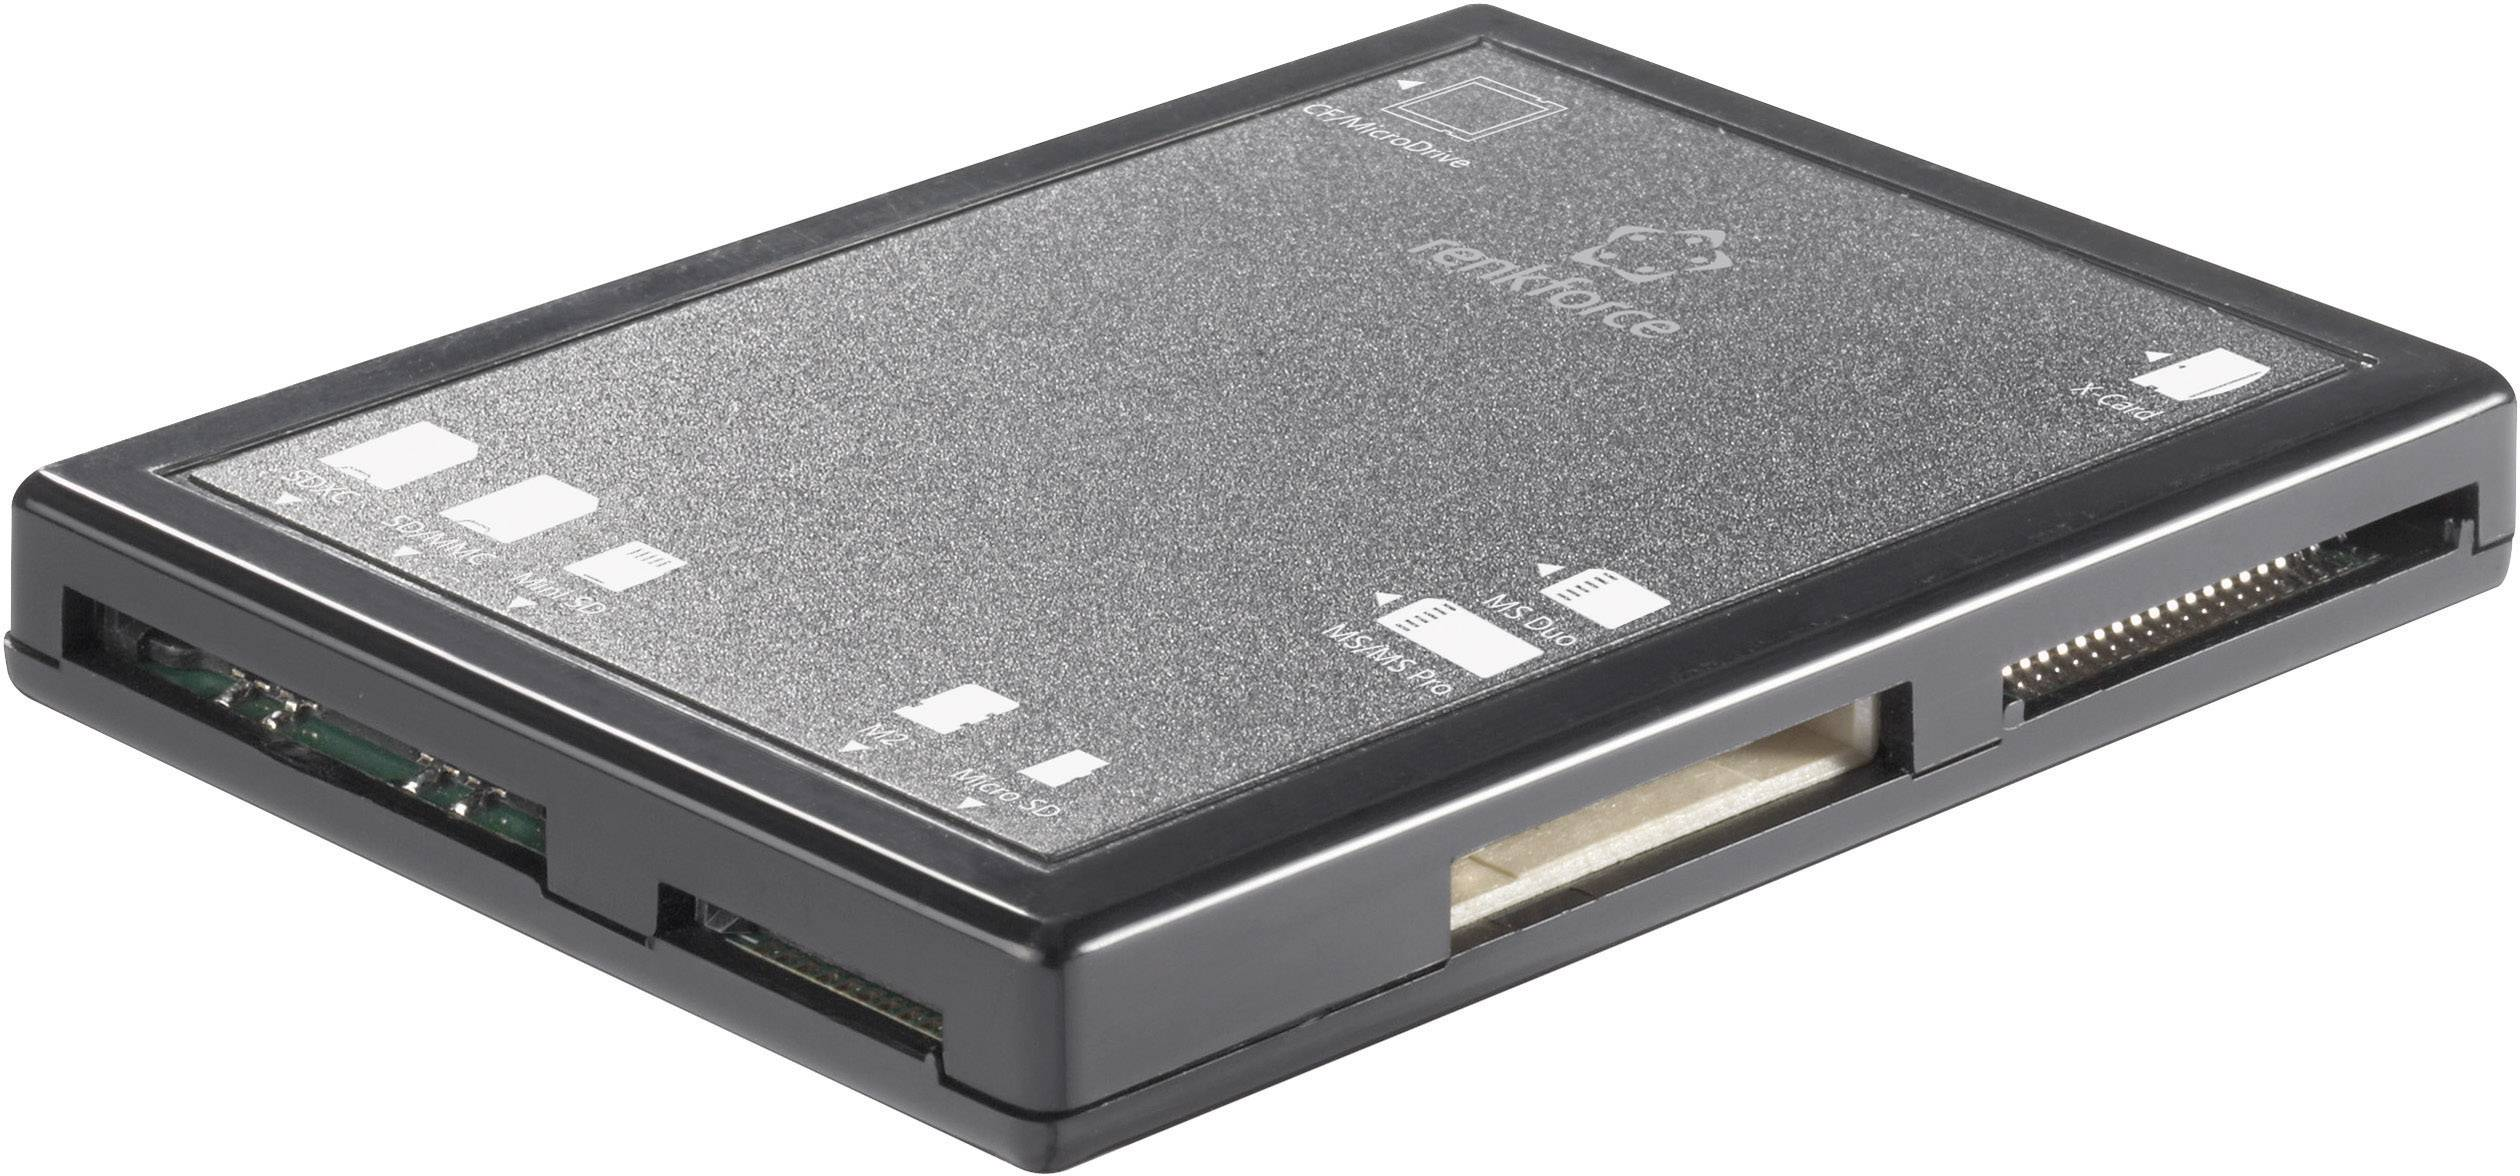 Externá čítačka pamäťových kariet Renkforce CR01e, USB 2.0